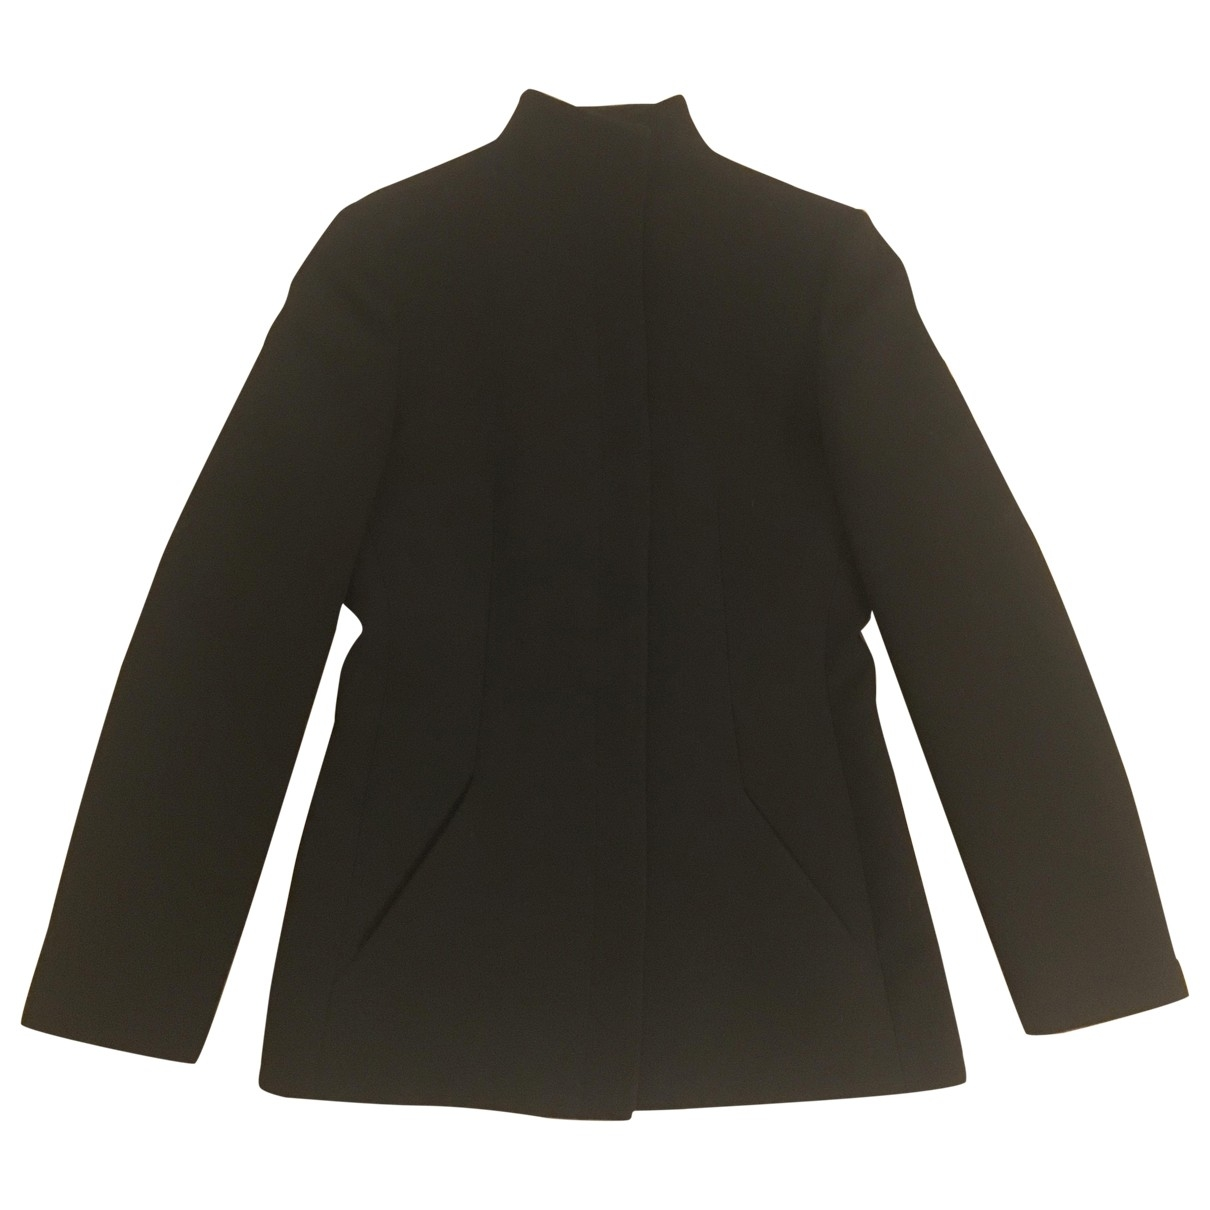 Emporio Armani \N Jacke in  Schwarz Polyester